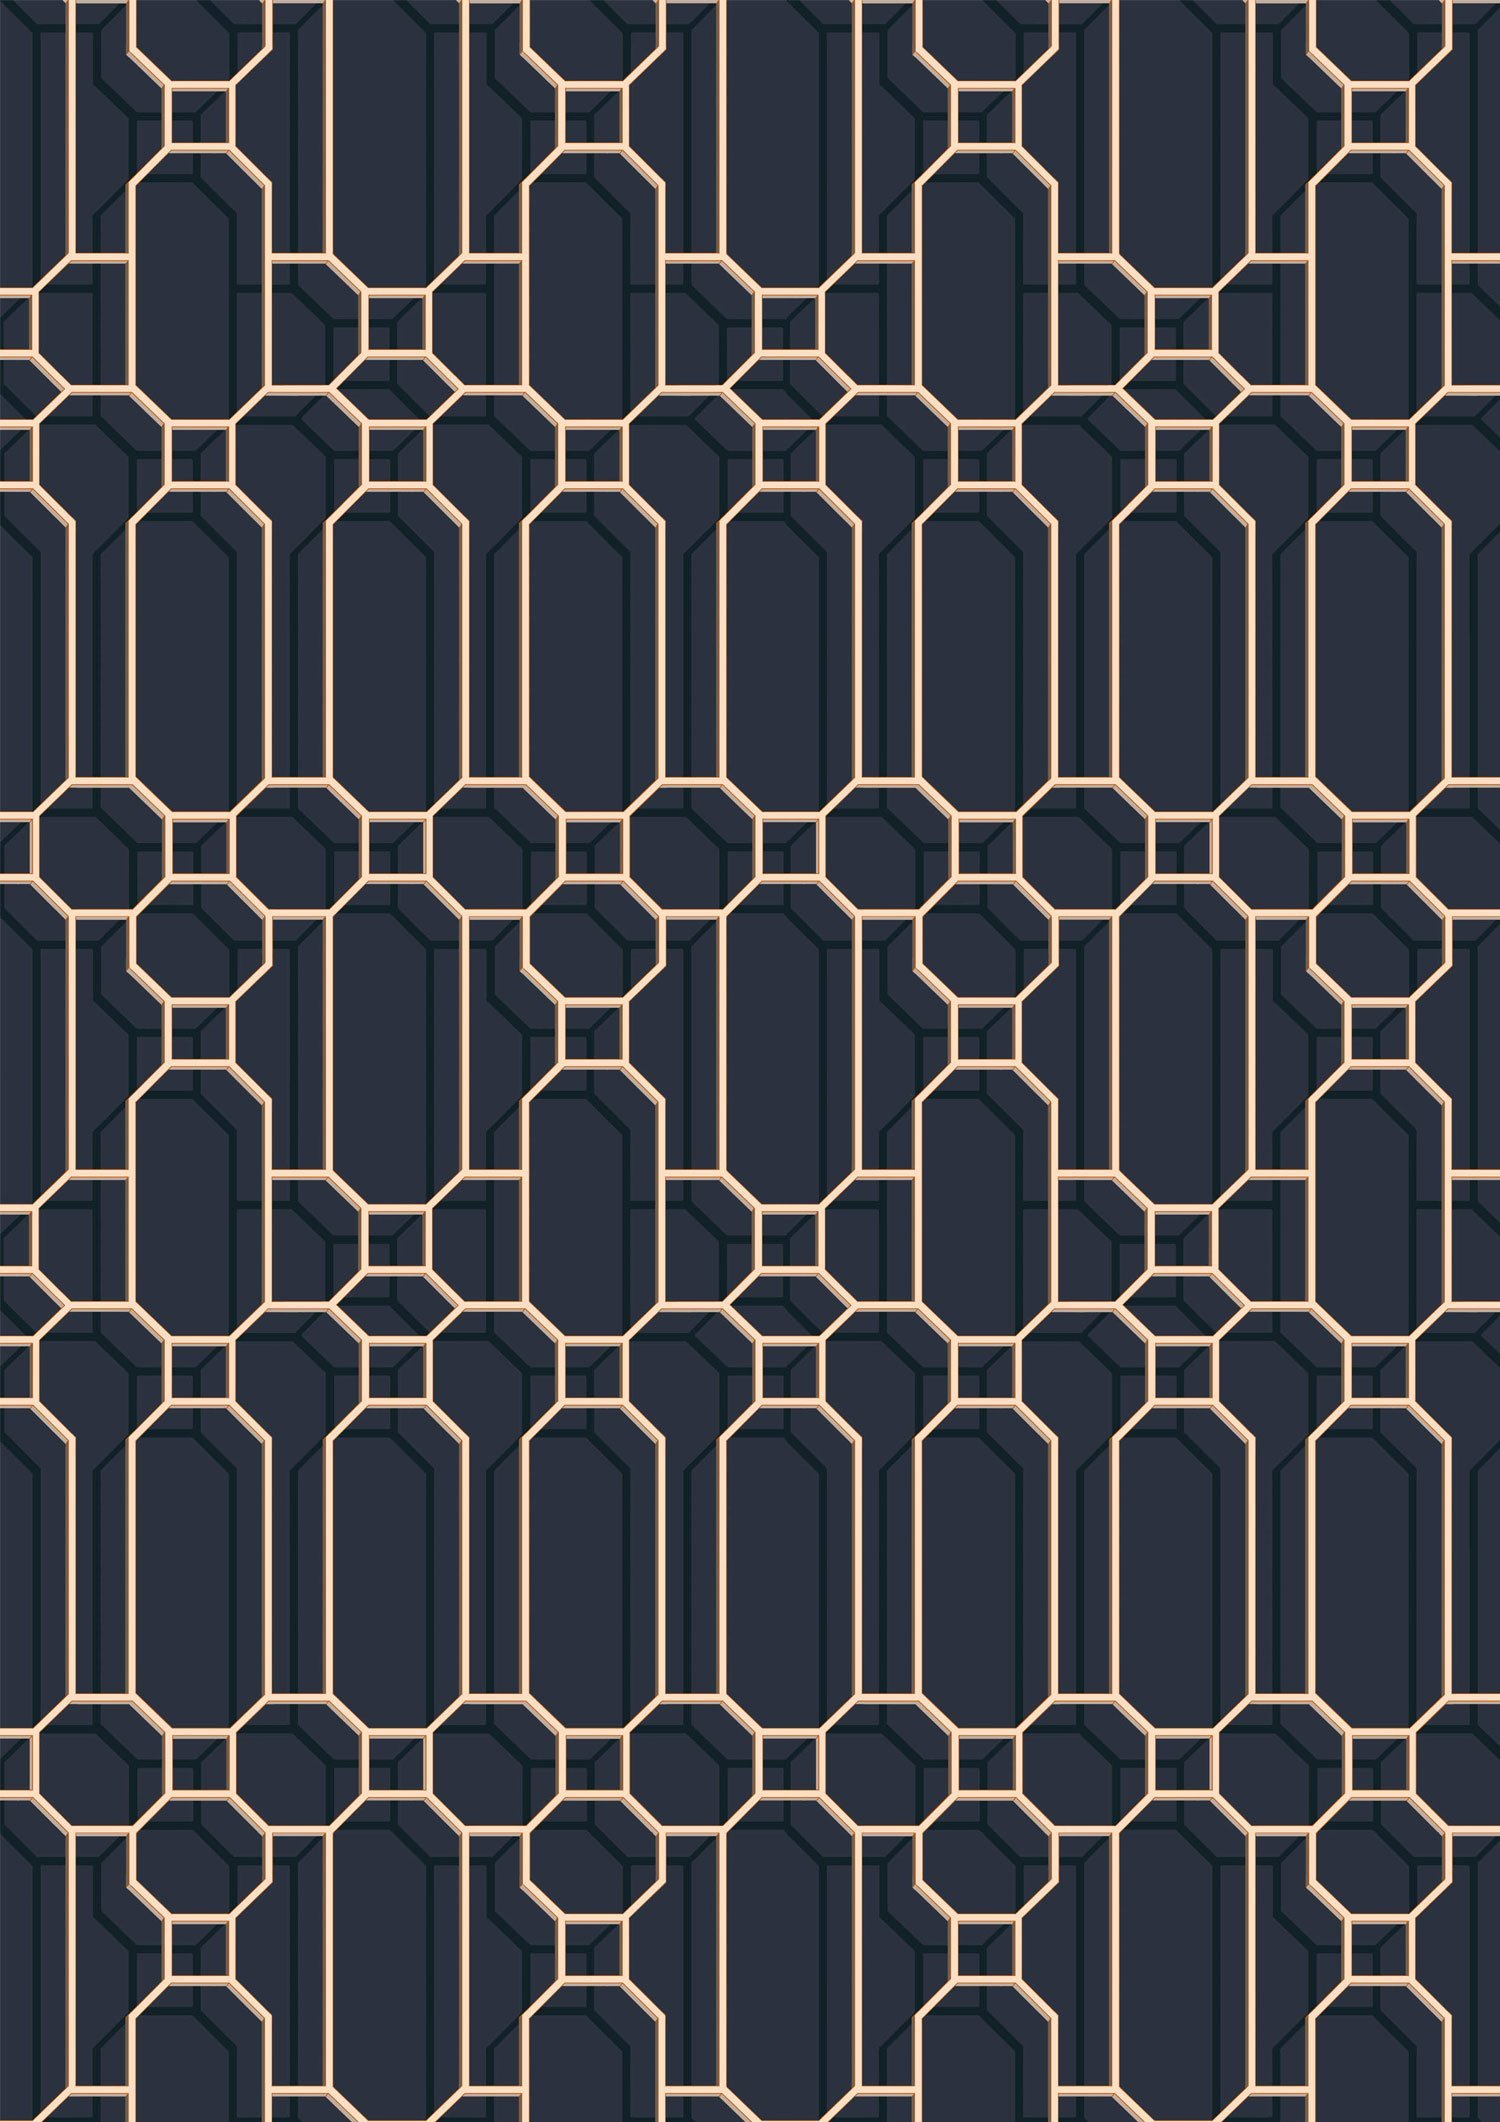 Fretwork-8941-501-repeat-image